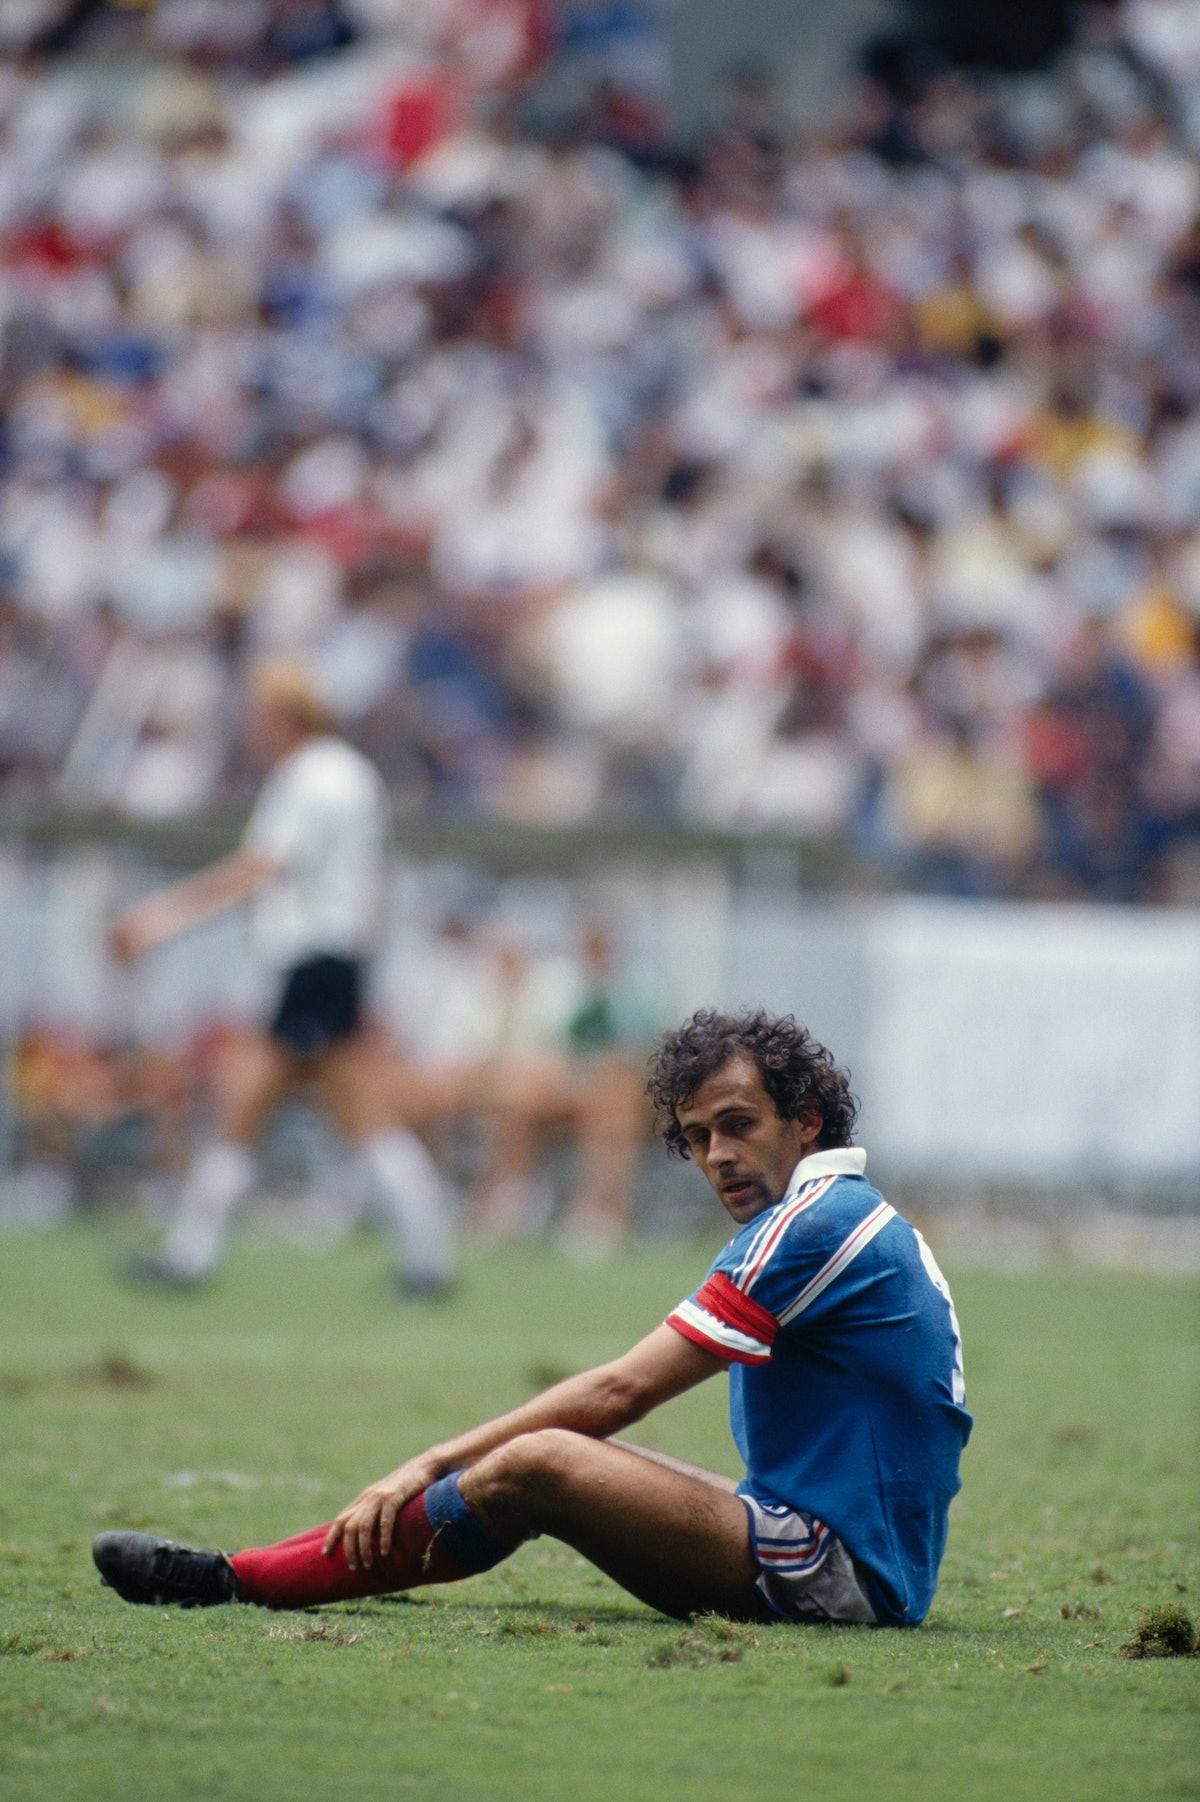 Soccer - 1986 FIFA World Cup - Michel Platini